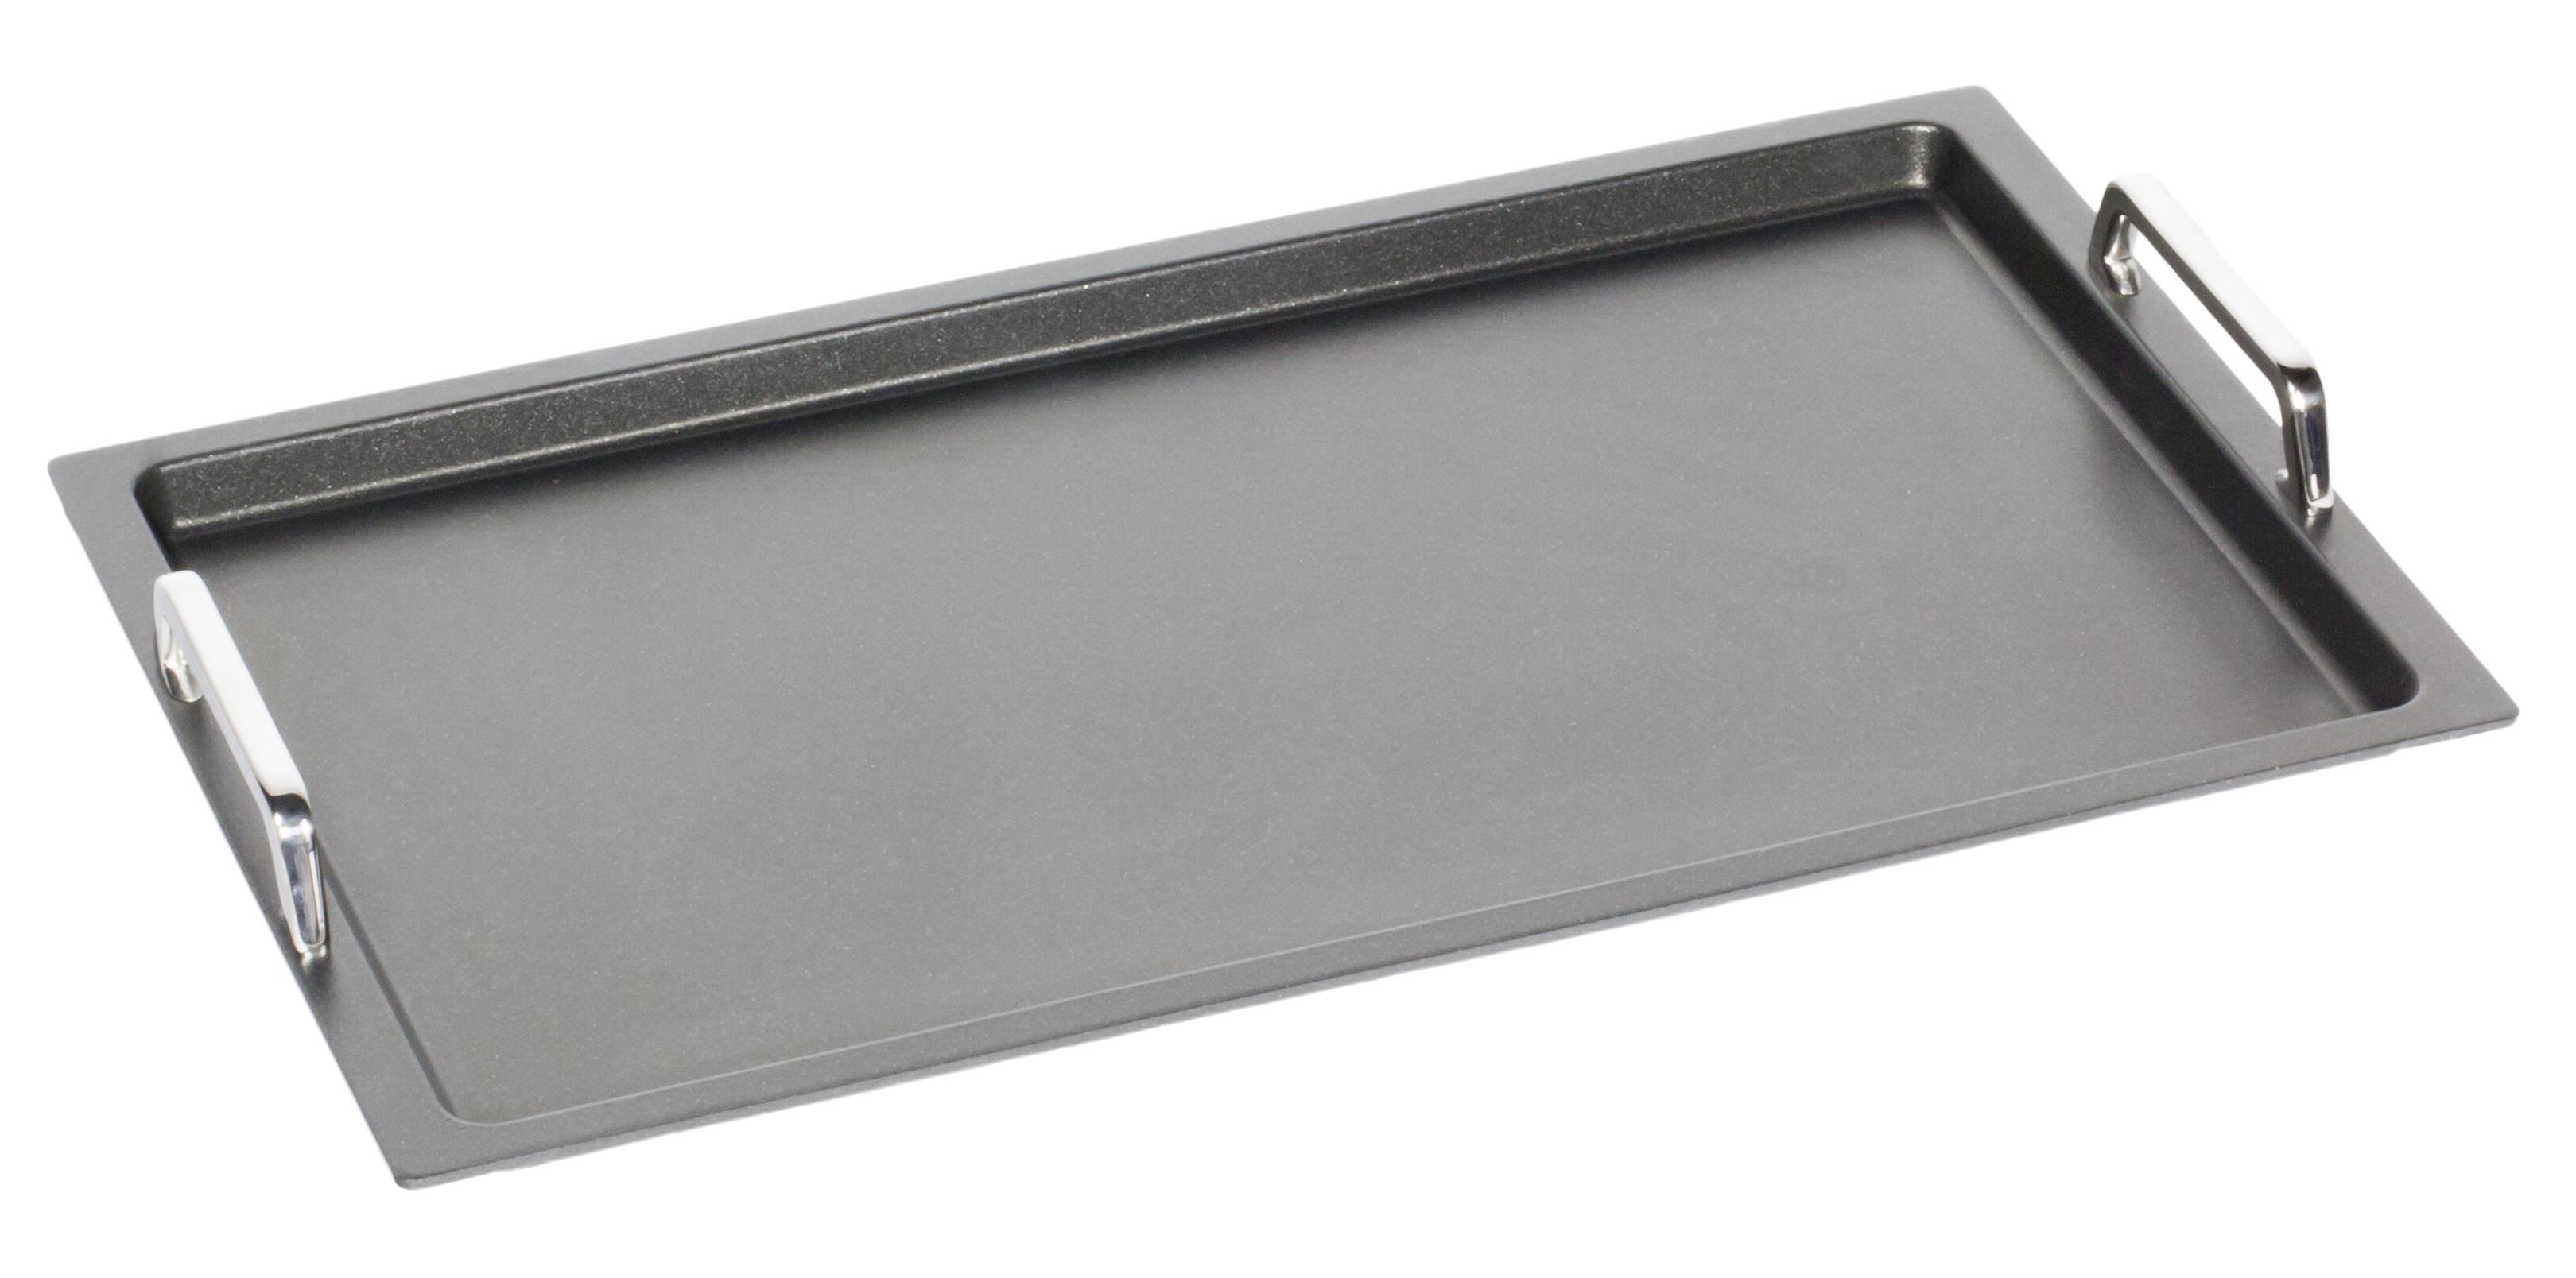 AMT Gastroguss Stekbord 53×33 cm